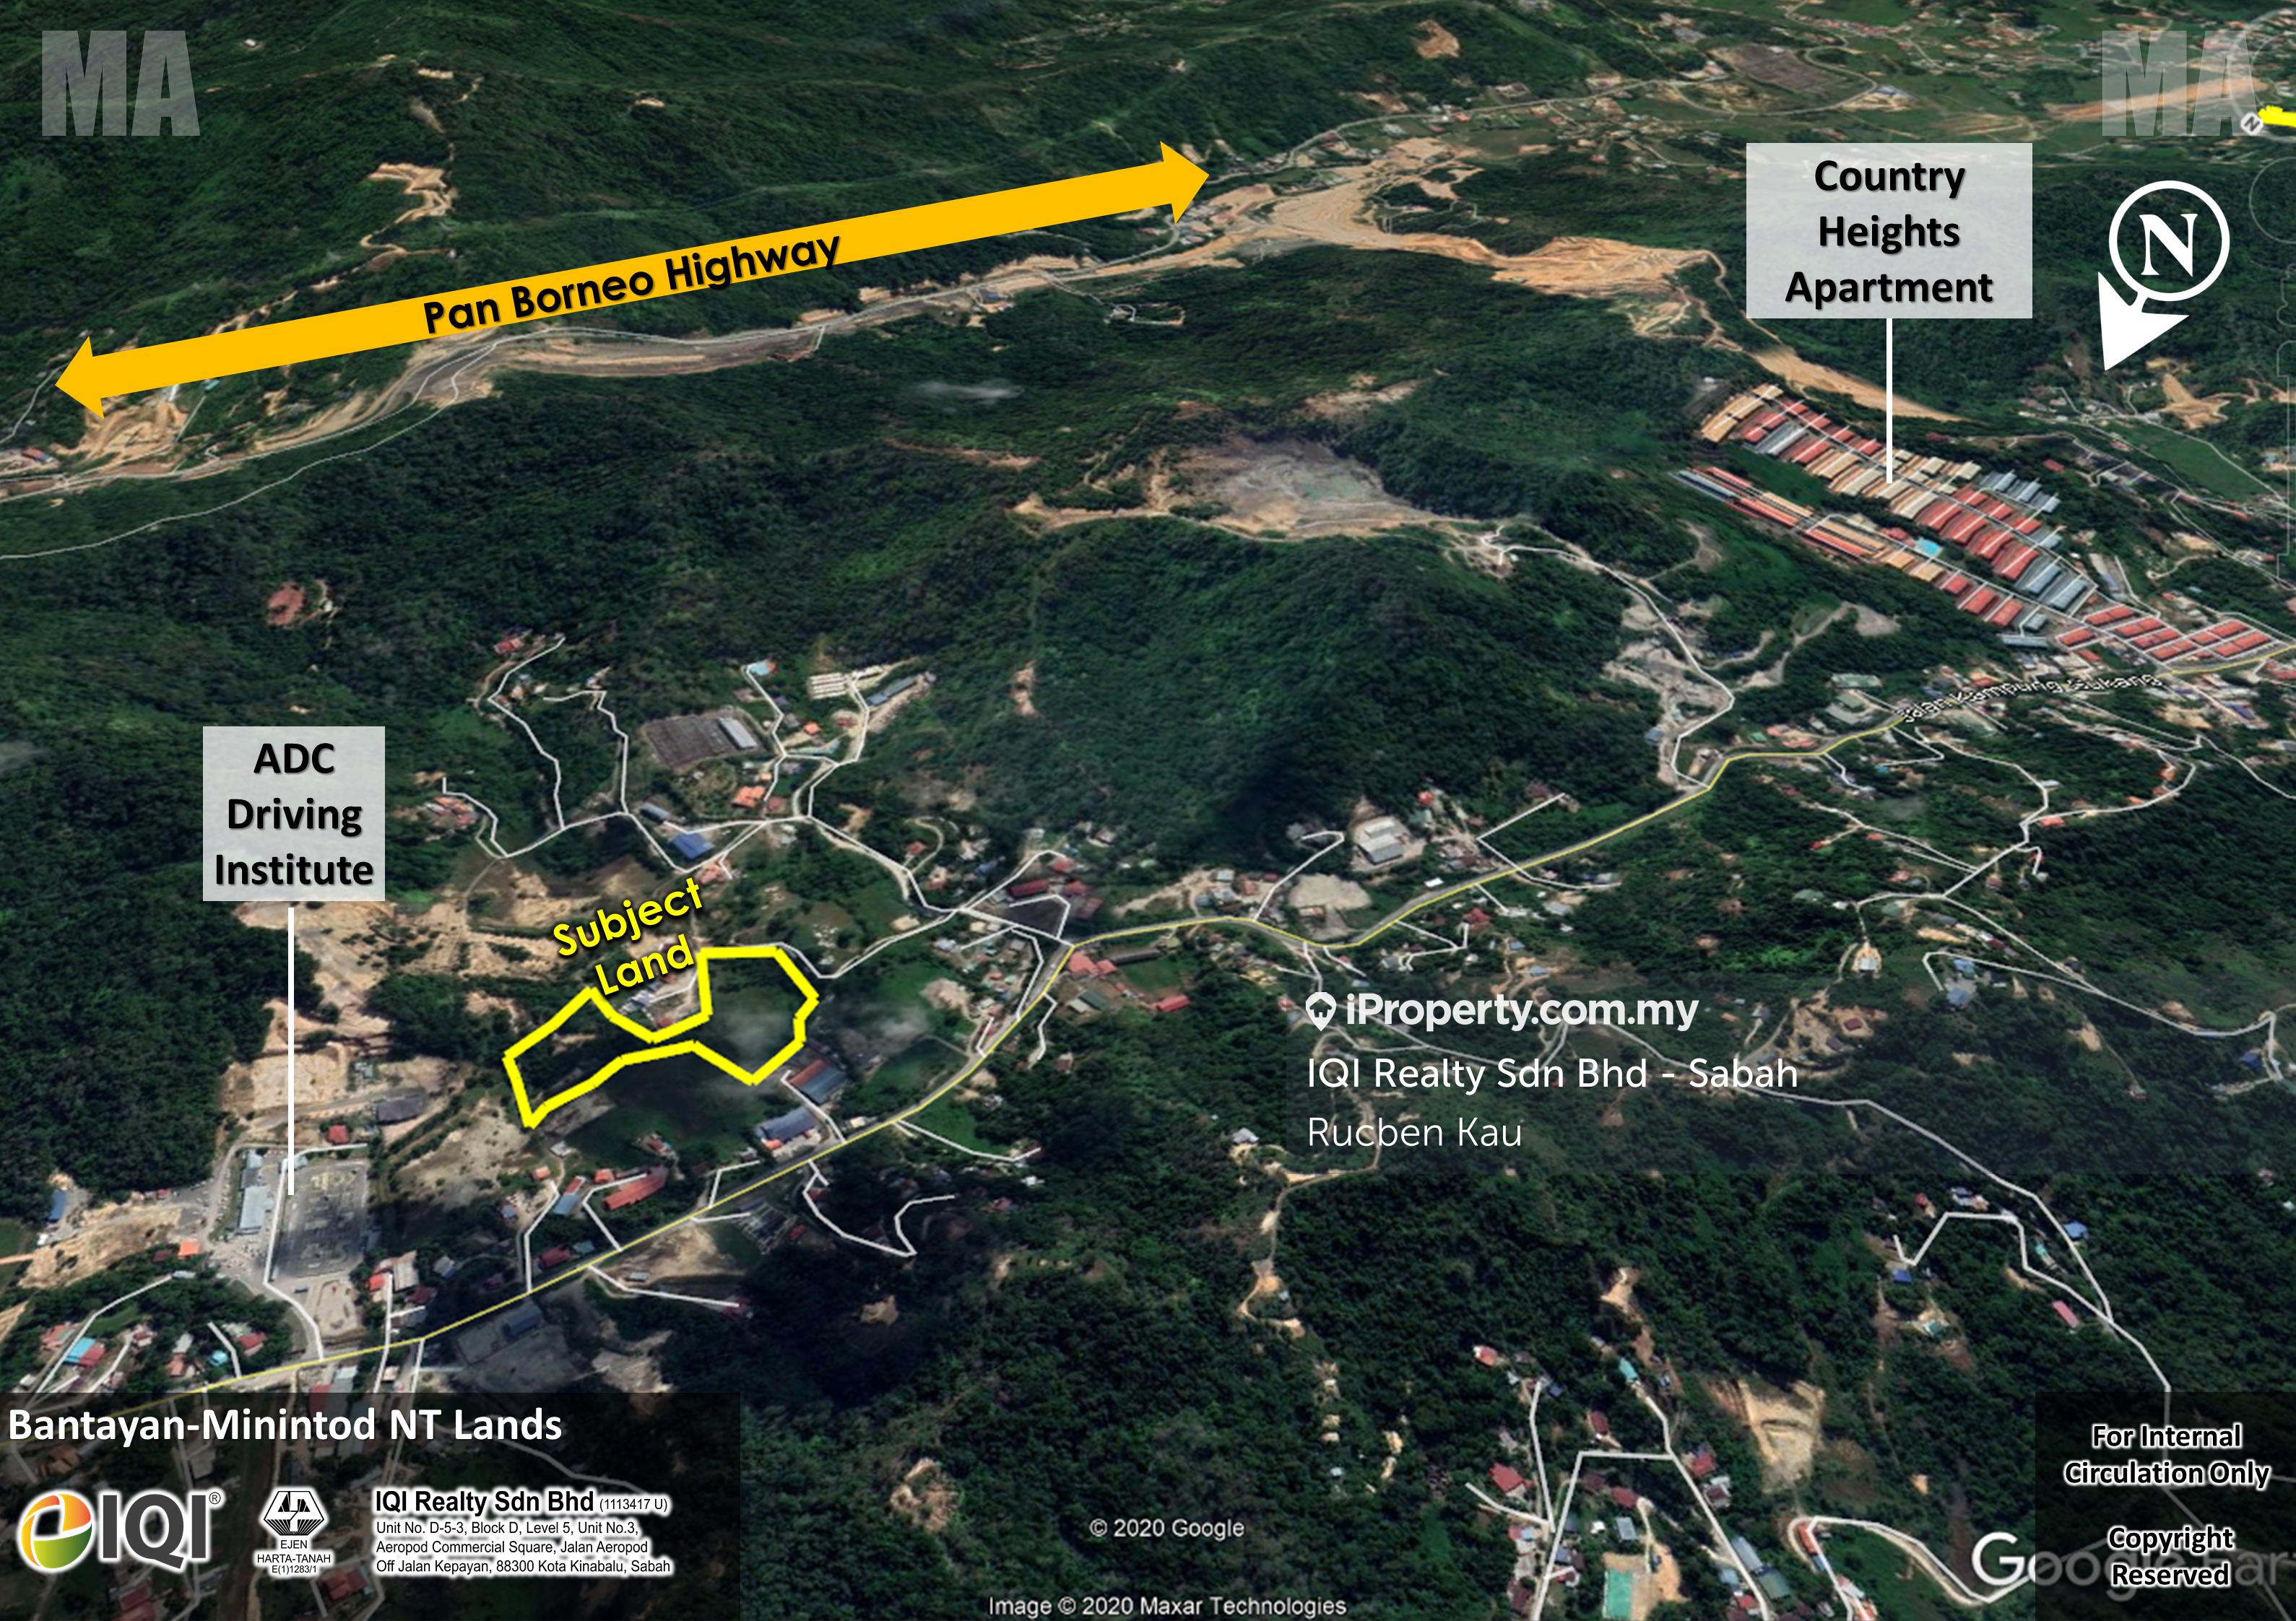 Donggongon Bantayan-Minintod NT Lands, Penampang